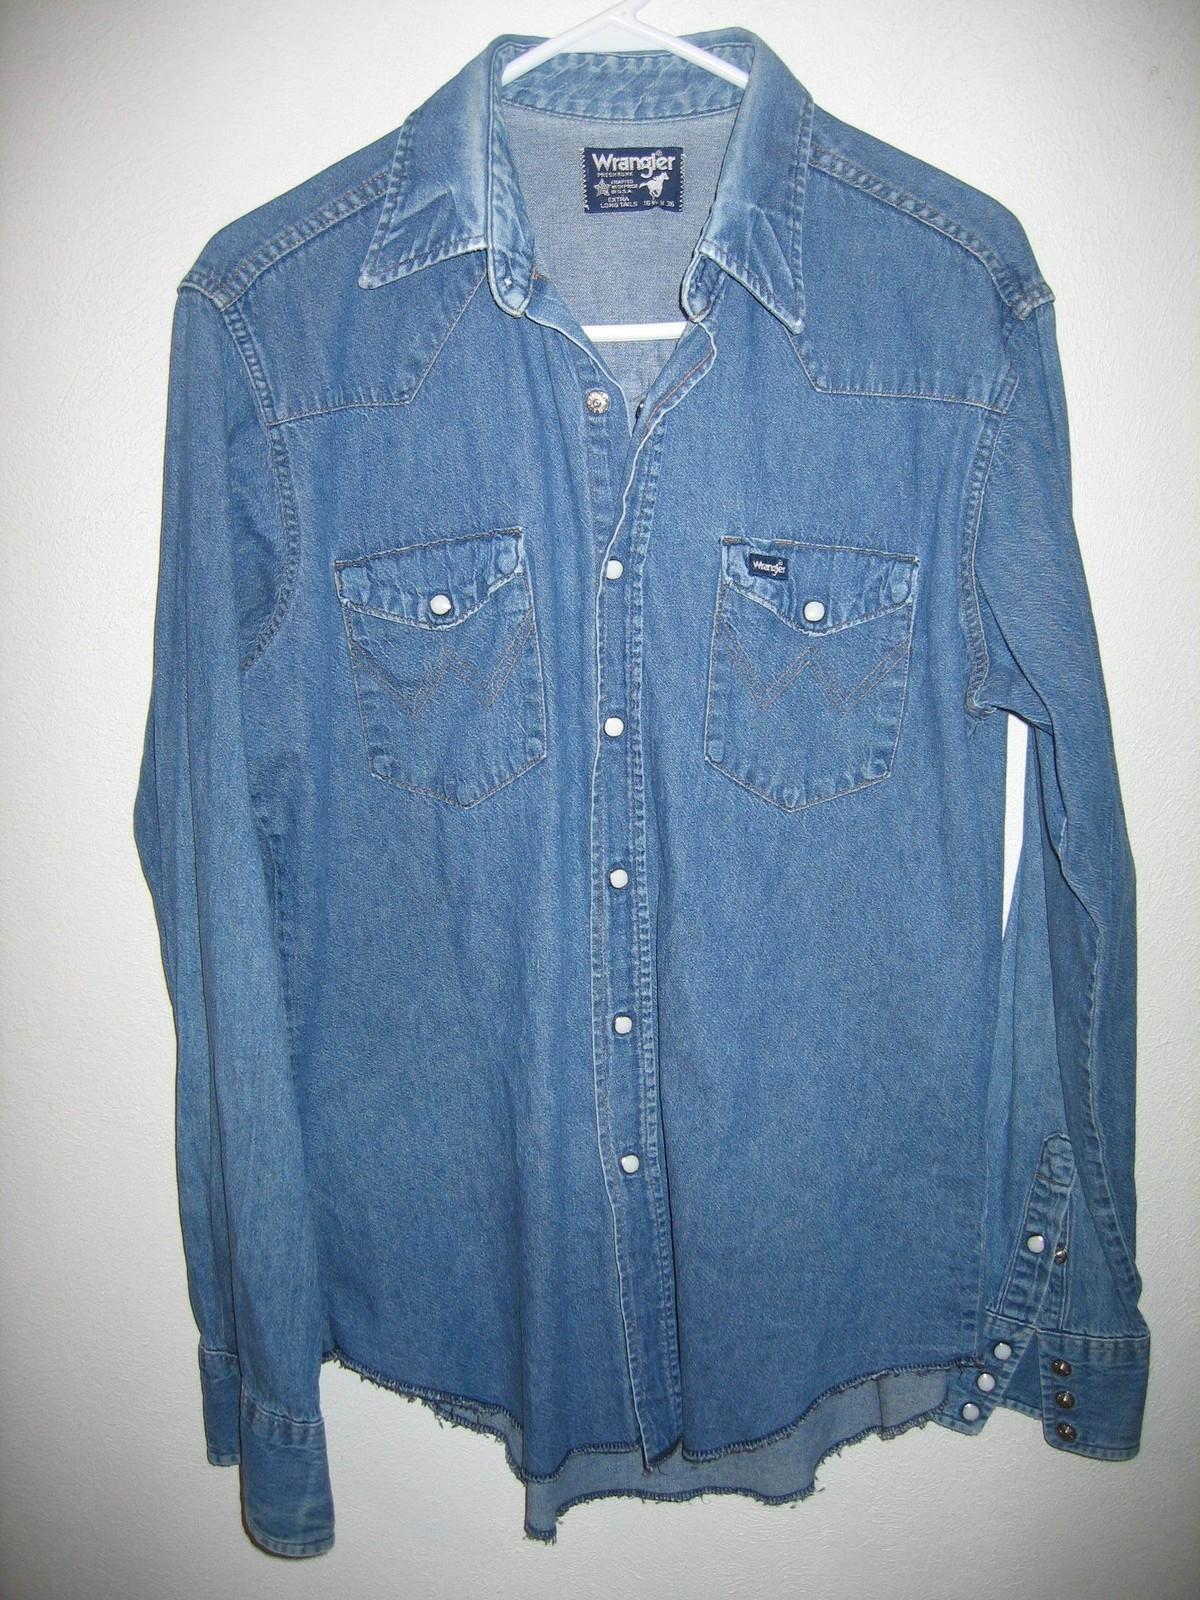 9846f9028aa Vintage Wrangler Denim Western Snaps Blue Cowboy Shirt Mens ...